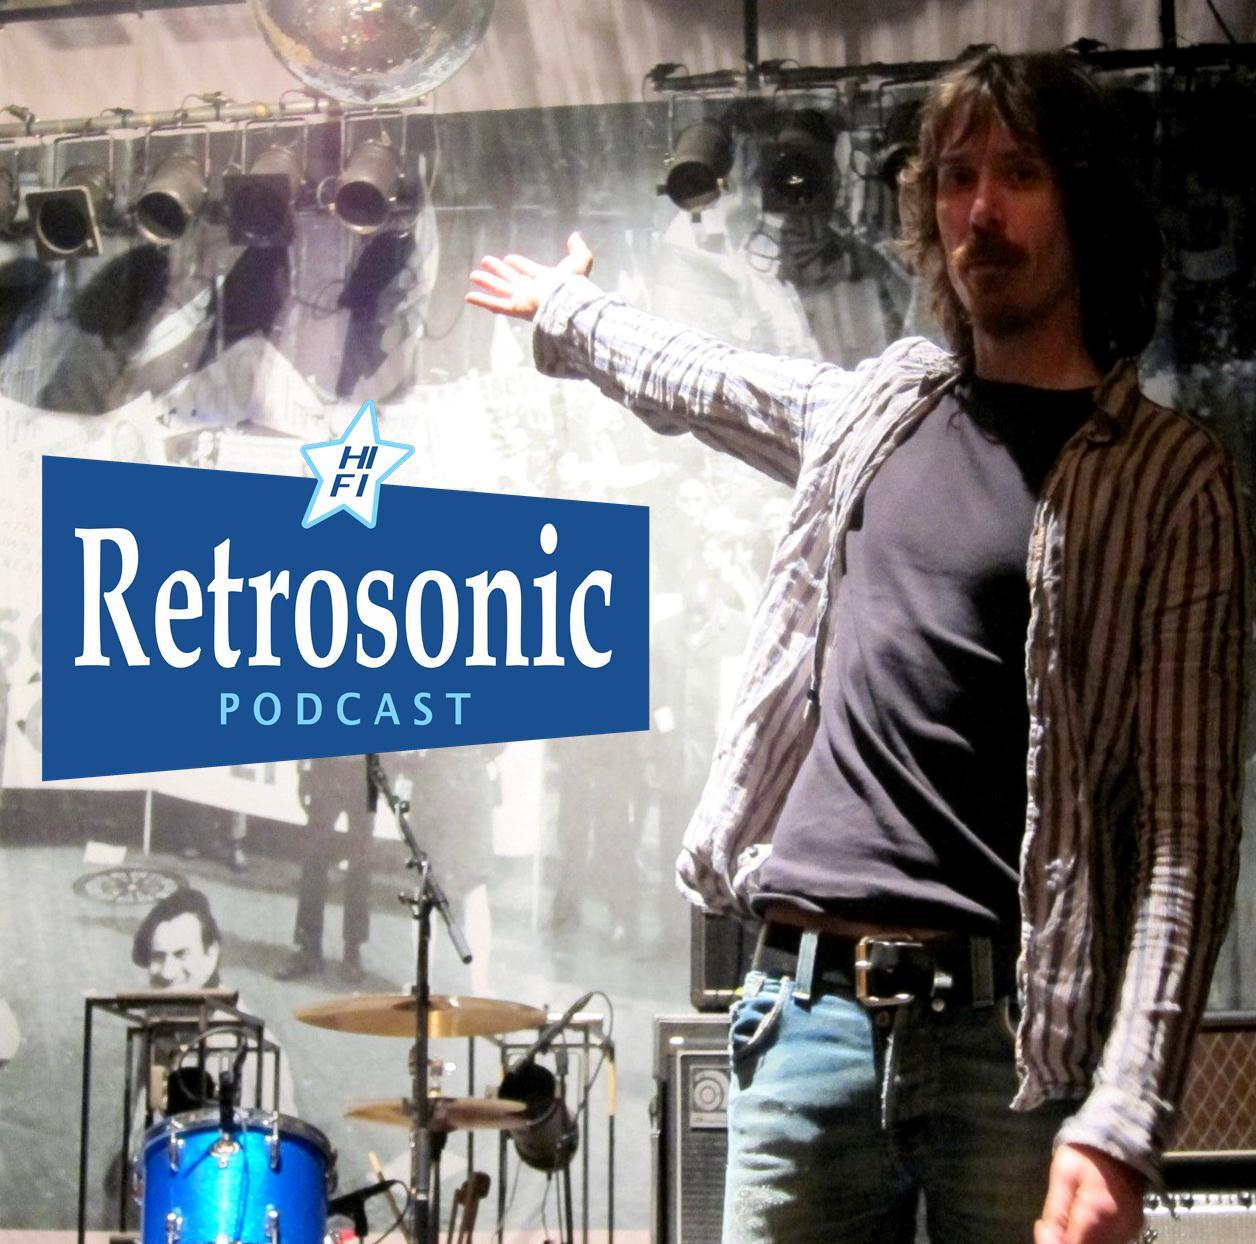 Retrosonic Podcast with Mattias Bärjed ex-The Soundtrack of Our Lives